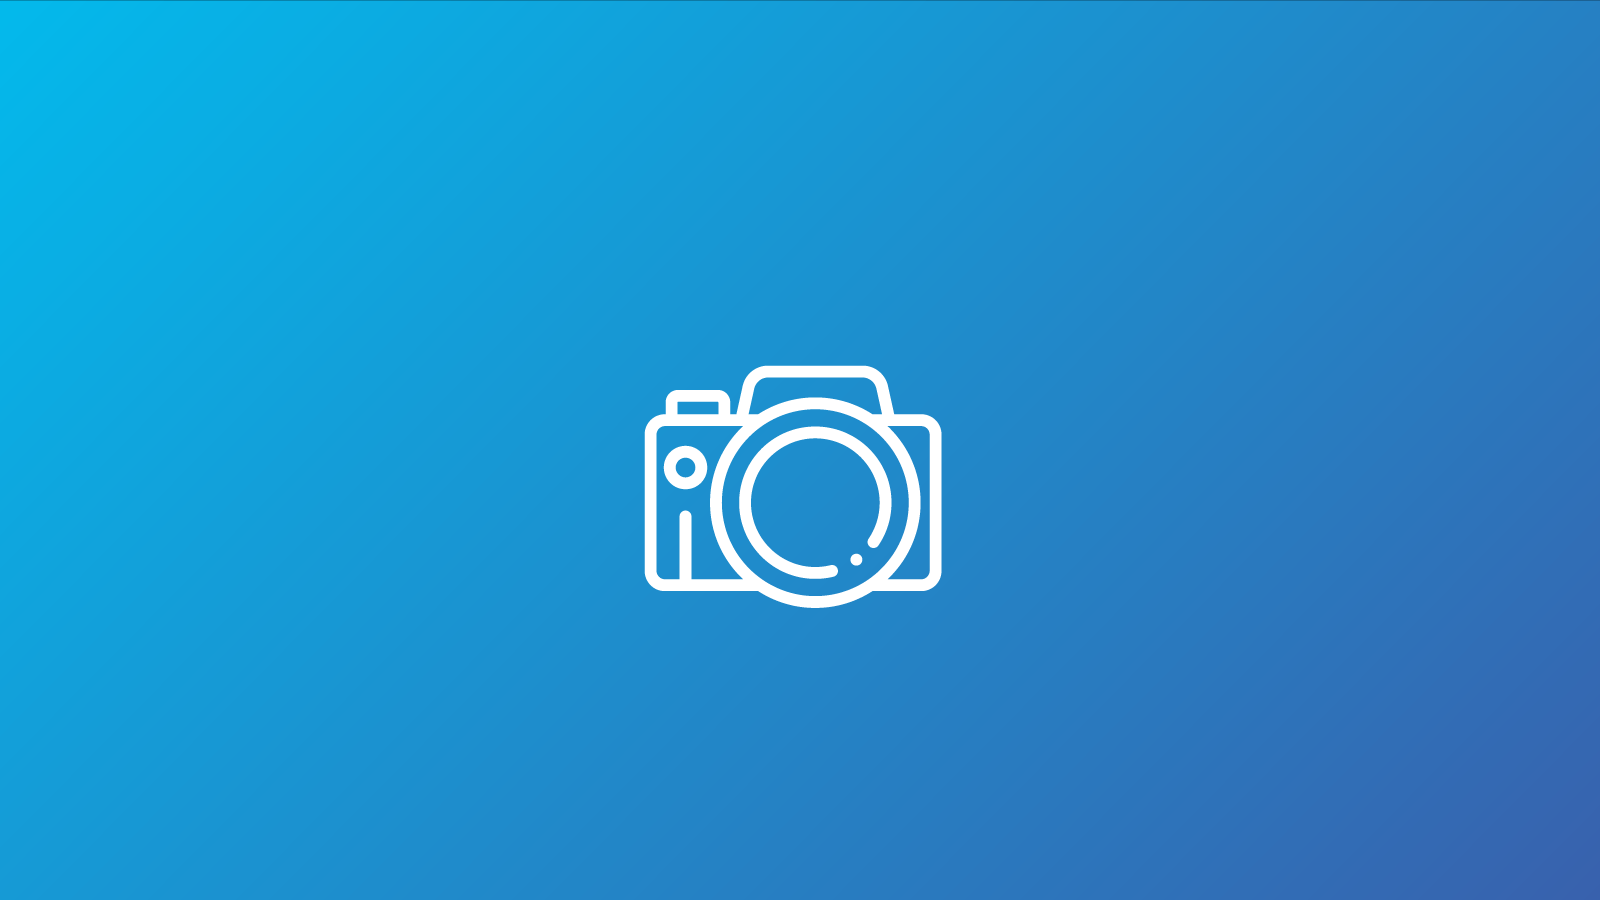 ico-foto